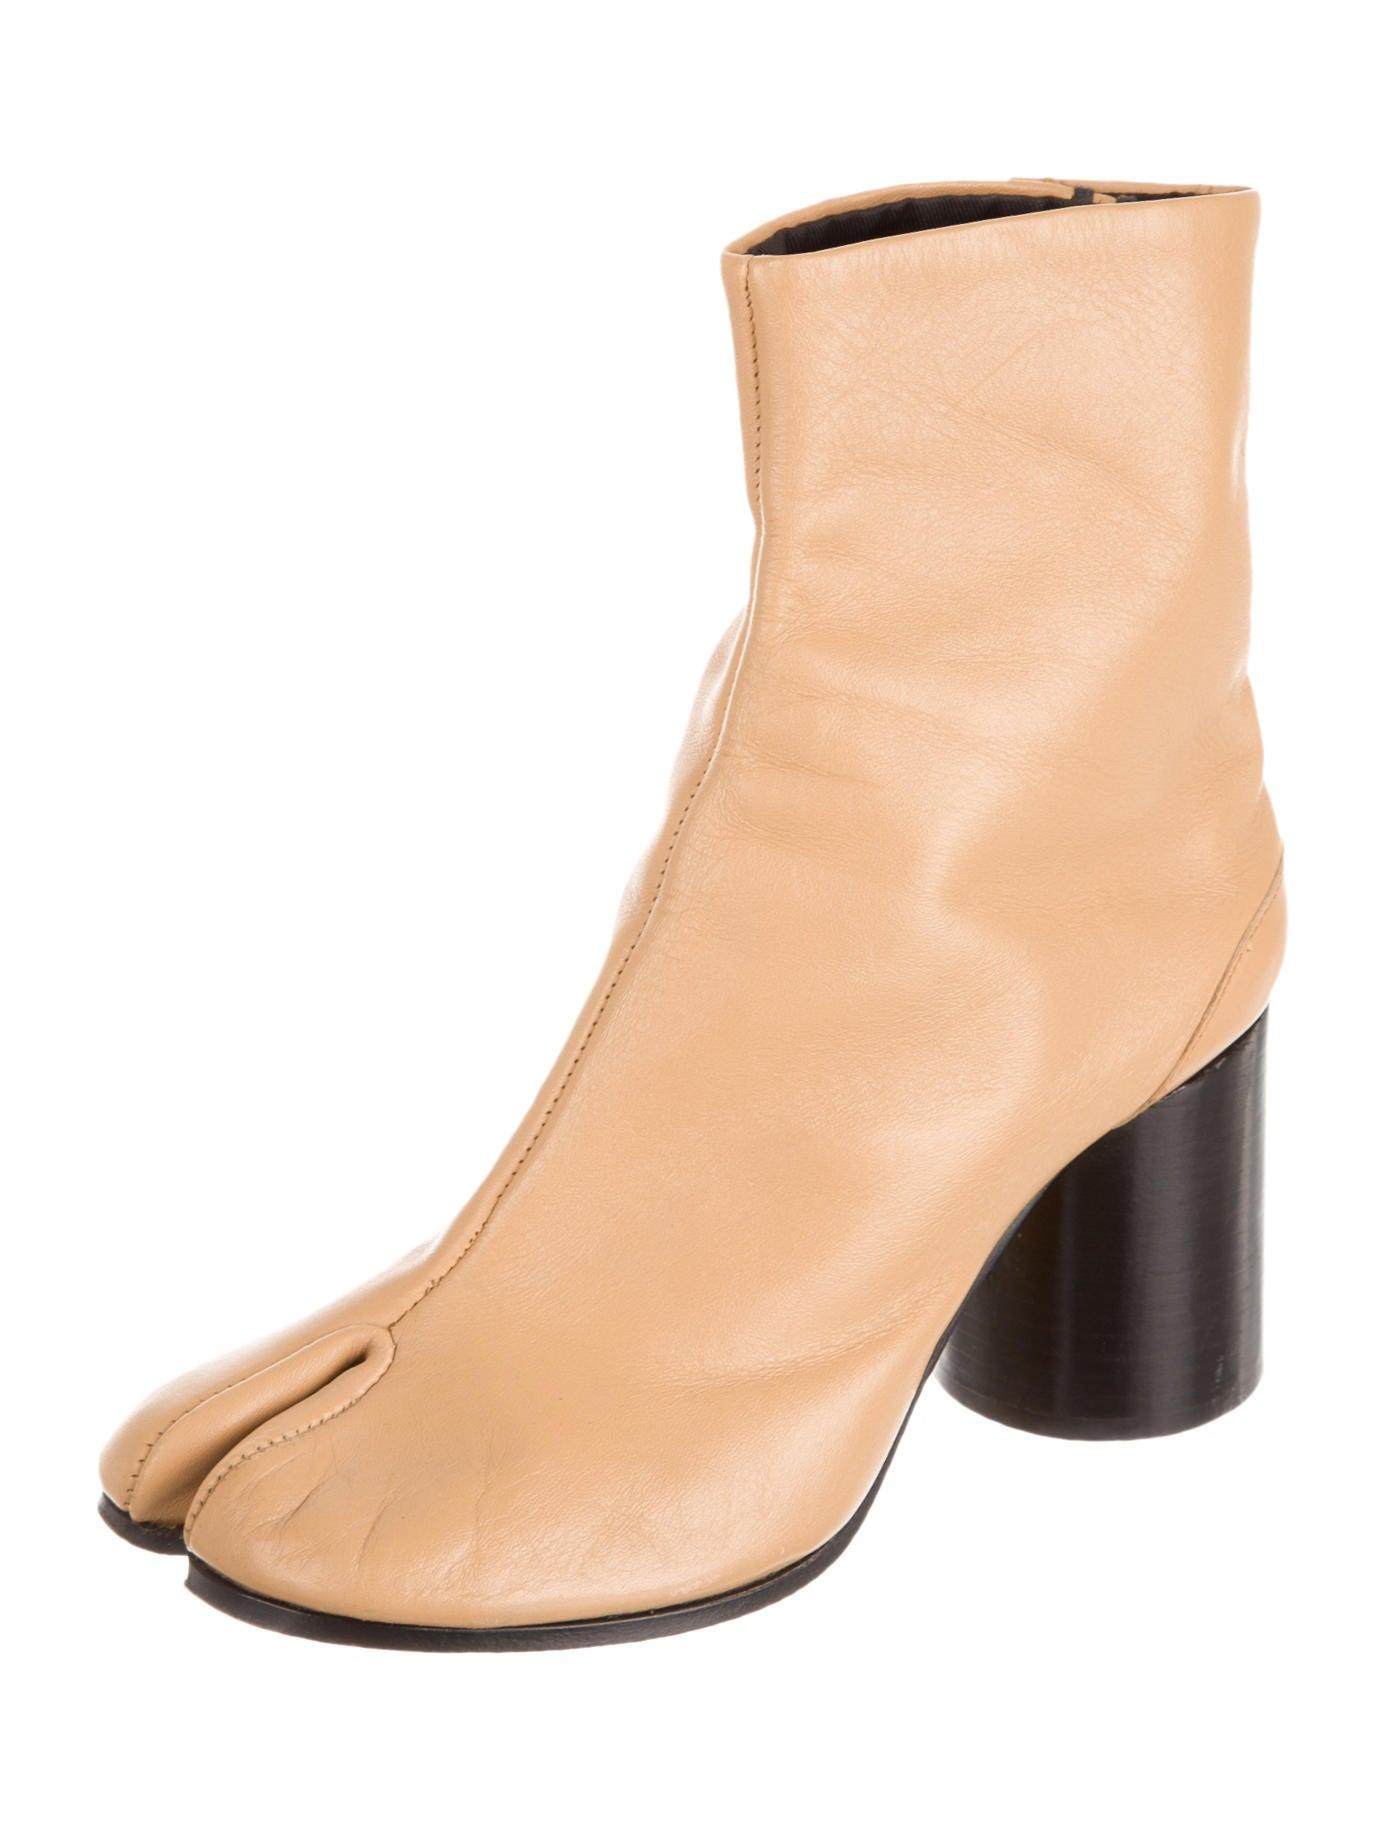 maison martin margiela tabi boots shoes mai22281 the realreal. Black Bedroom Furniture Sets. Home Design Ideas